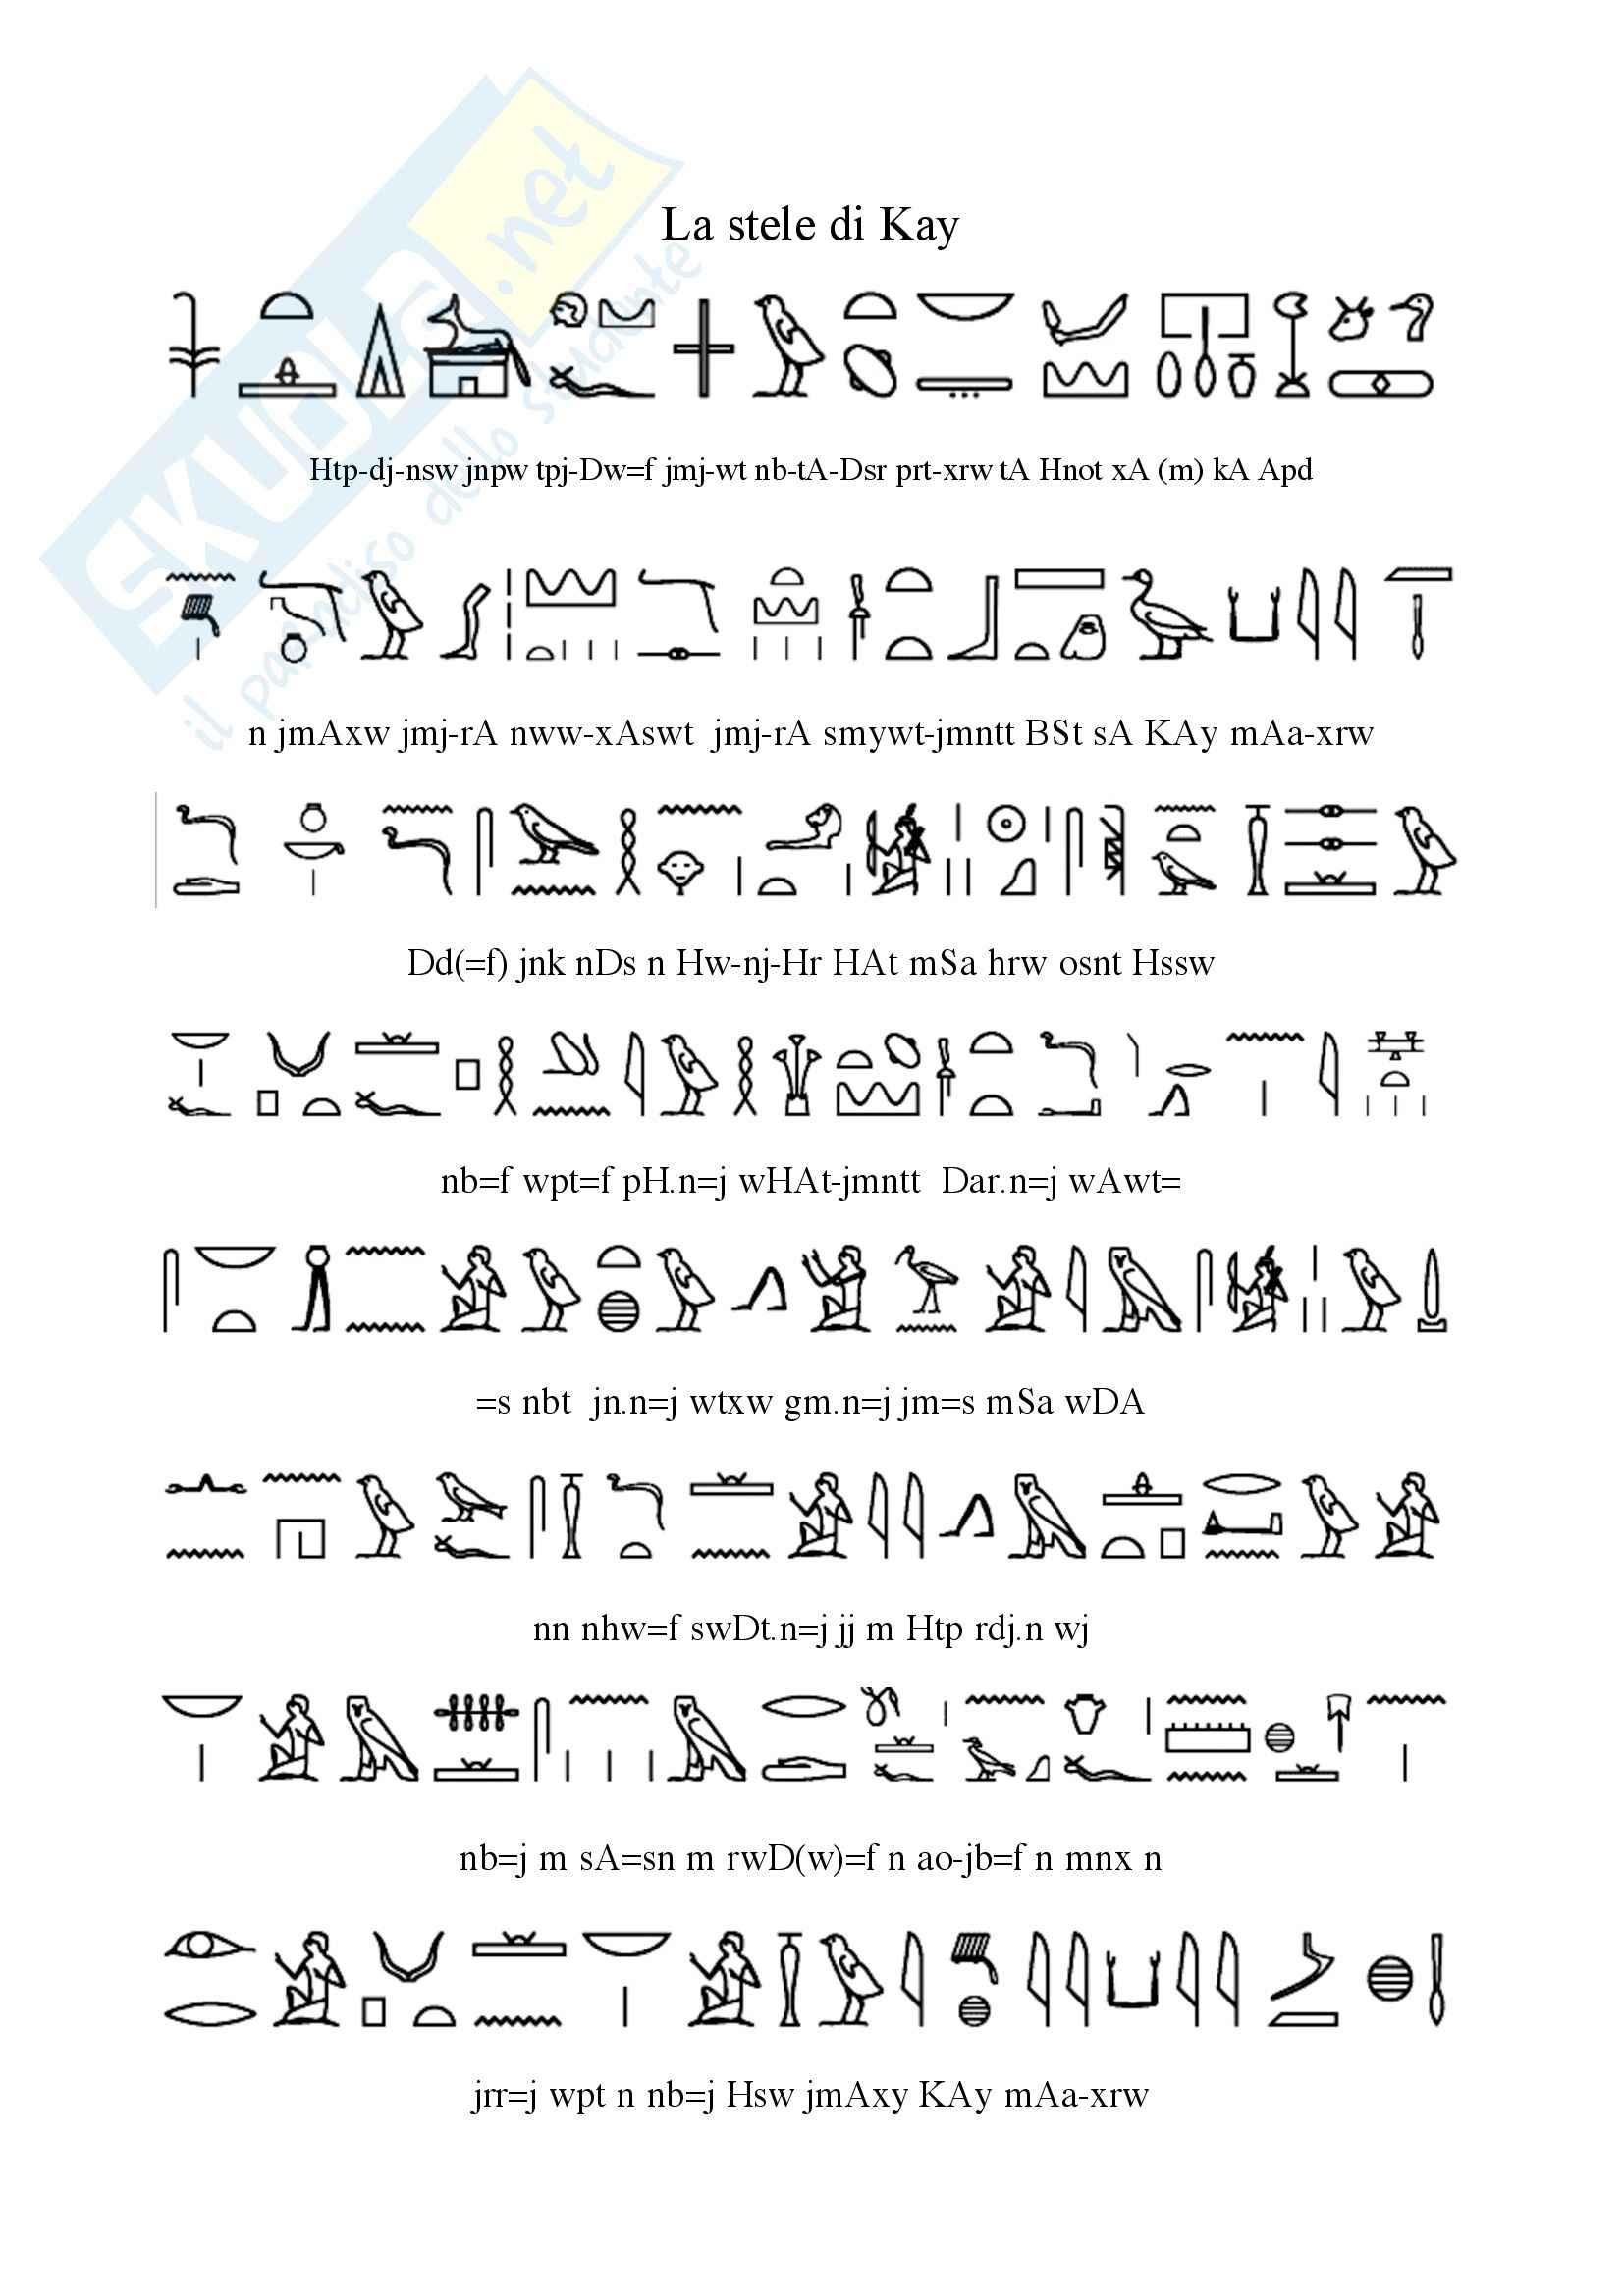 Egittologia - La Stele di Kay